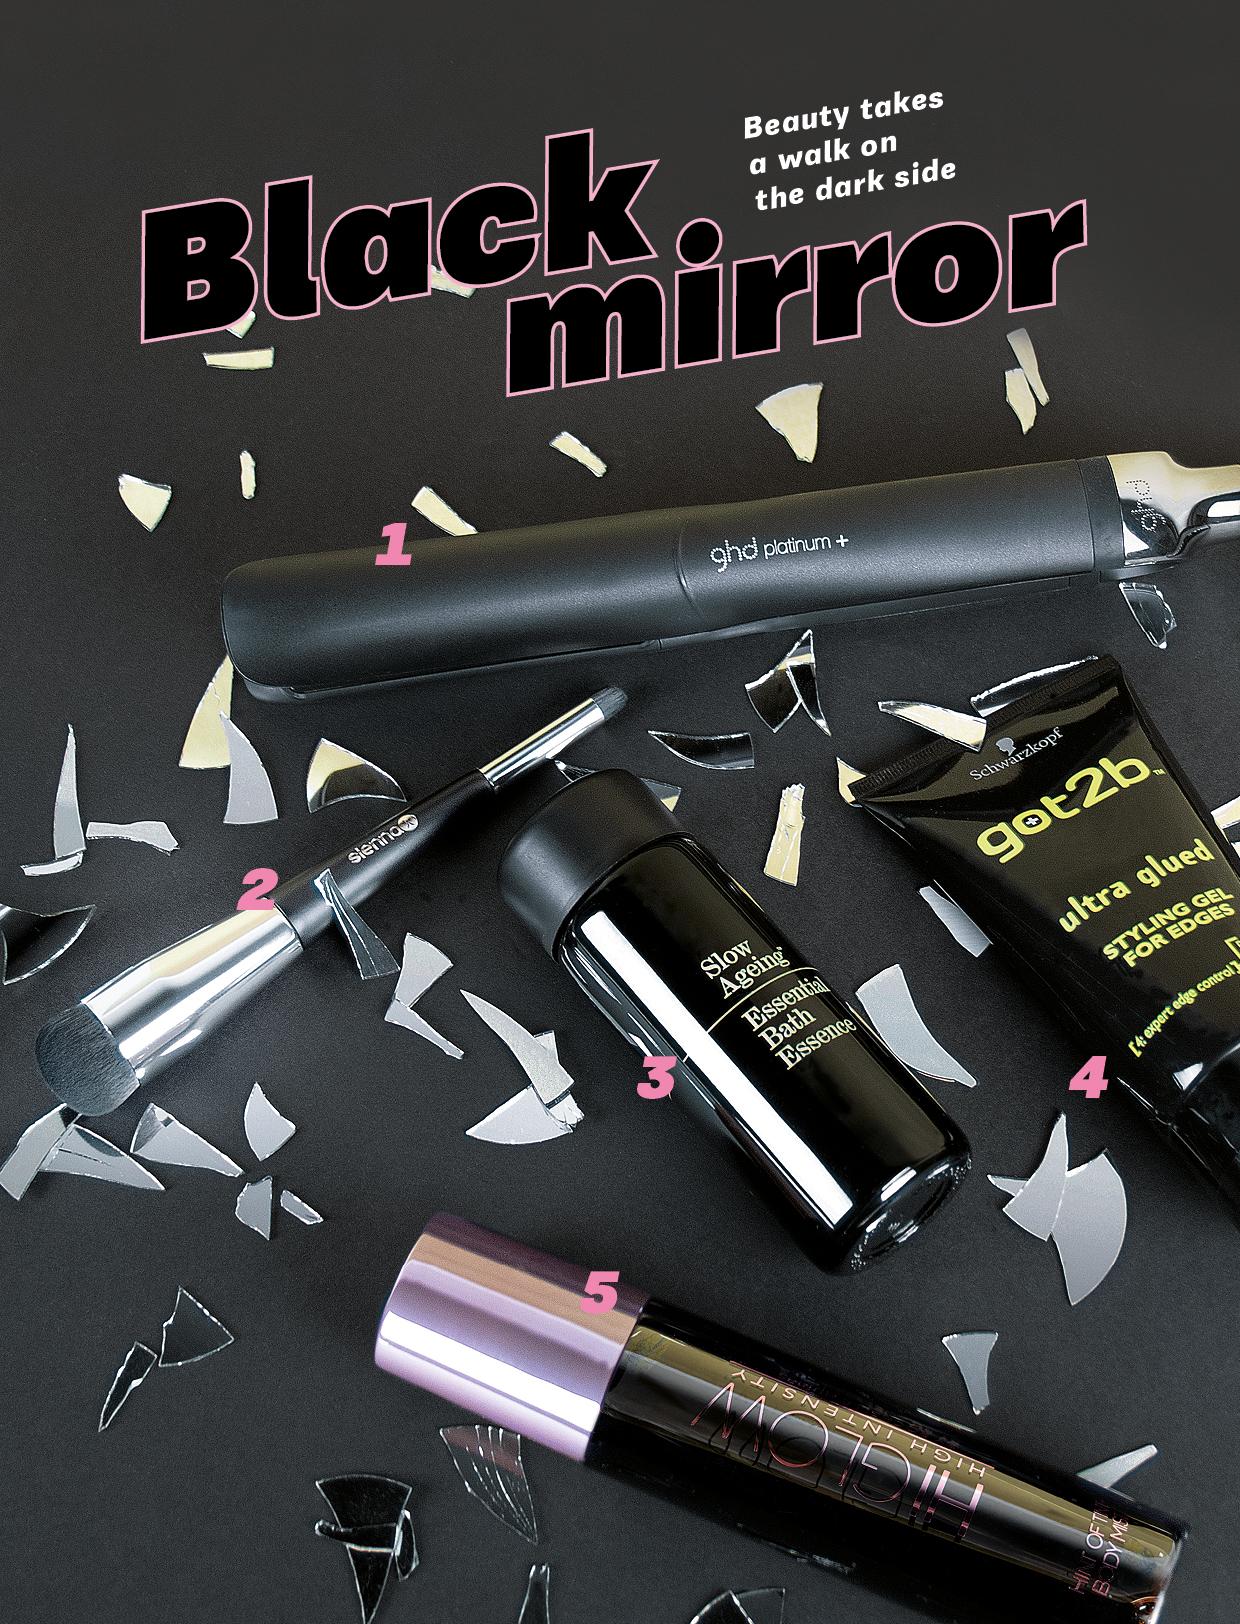 Black mirror - dark beauty